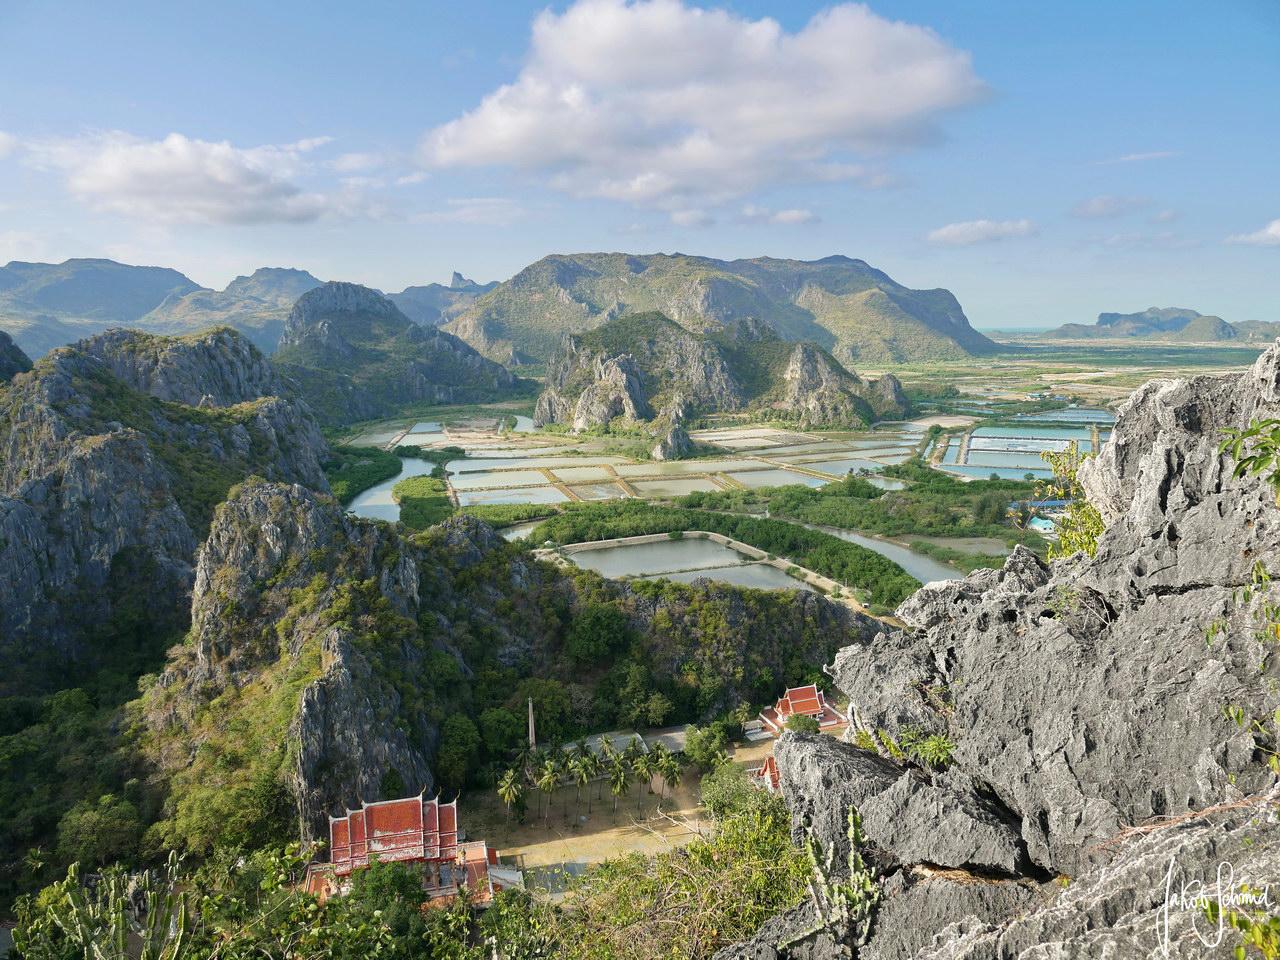 Thailand Nationalpark Khao Sam Roi Yot Khao Daeng Viewpoint